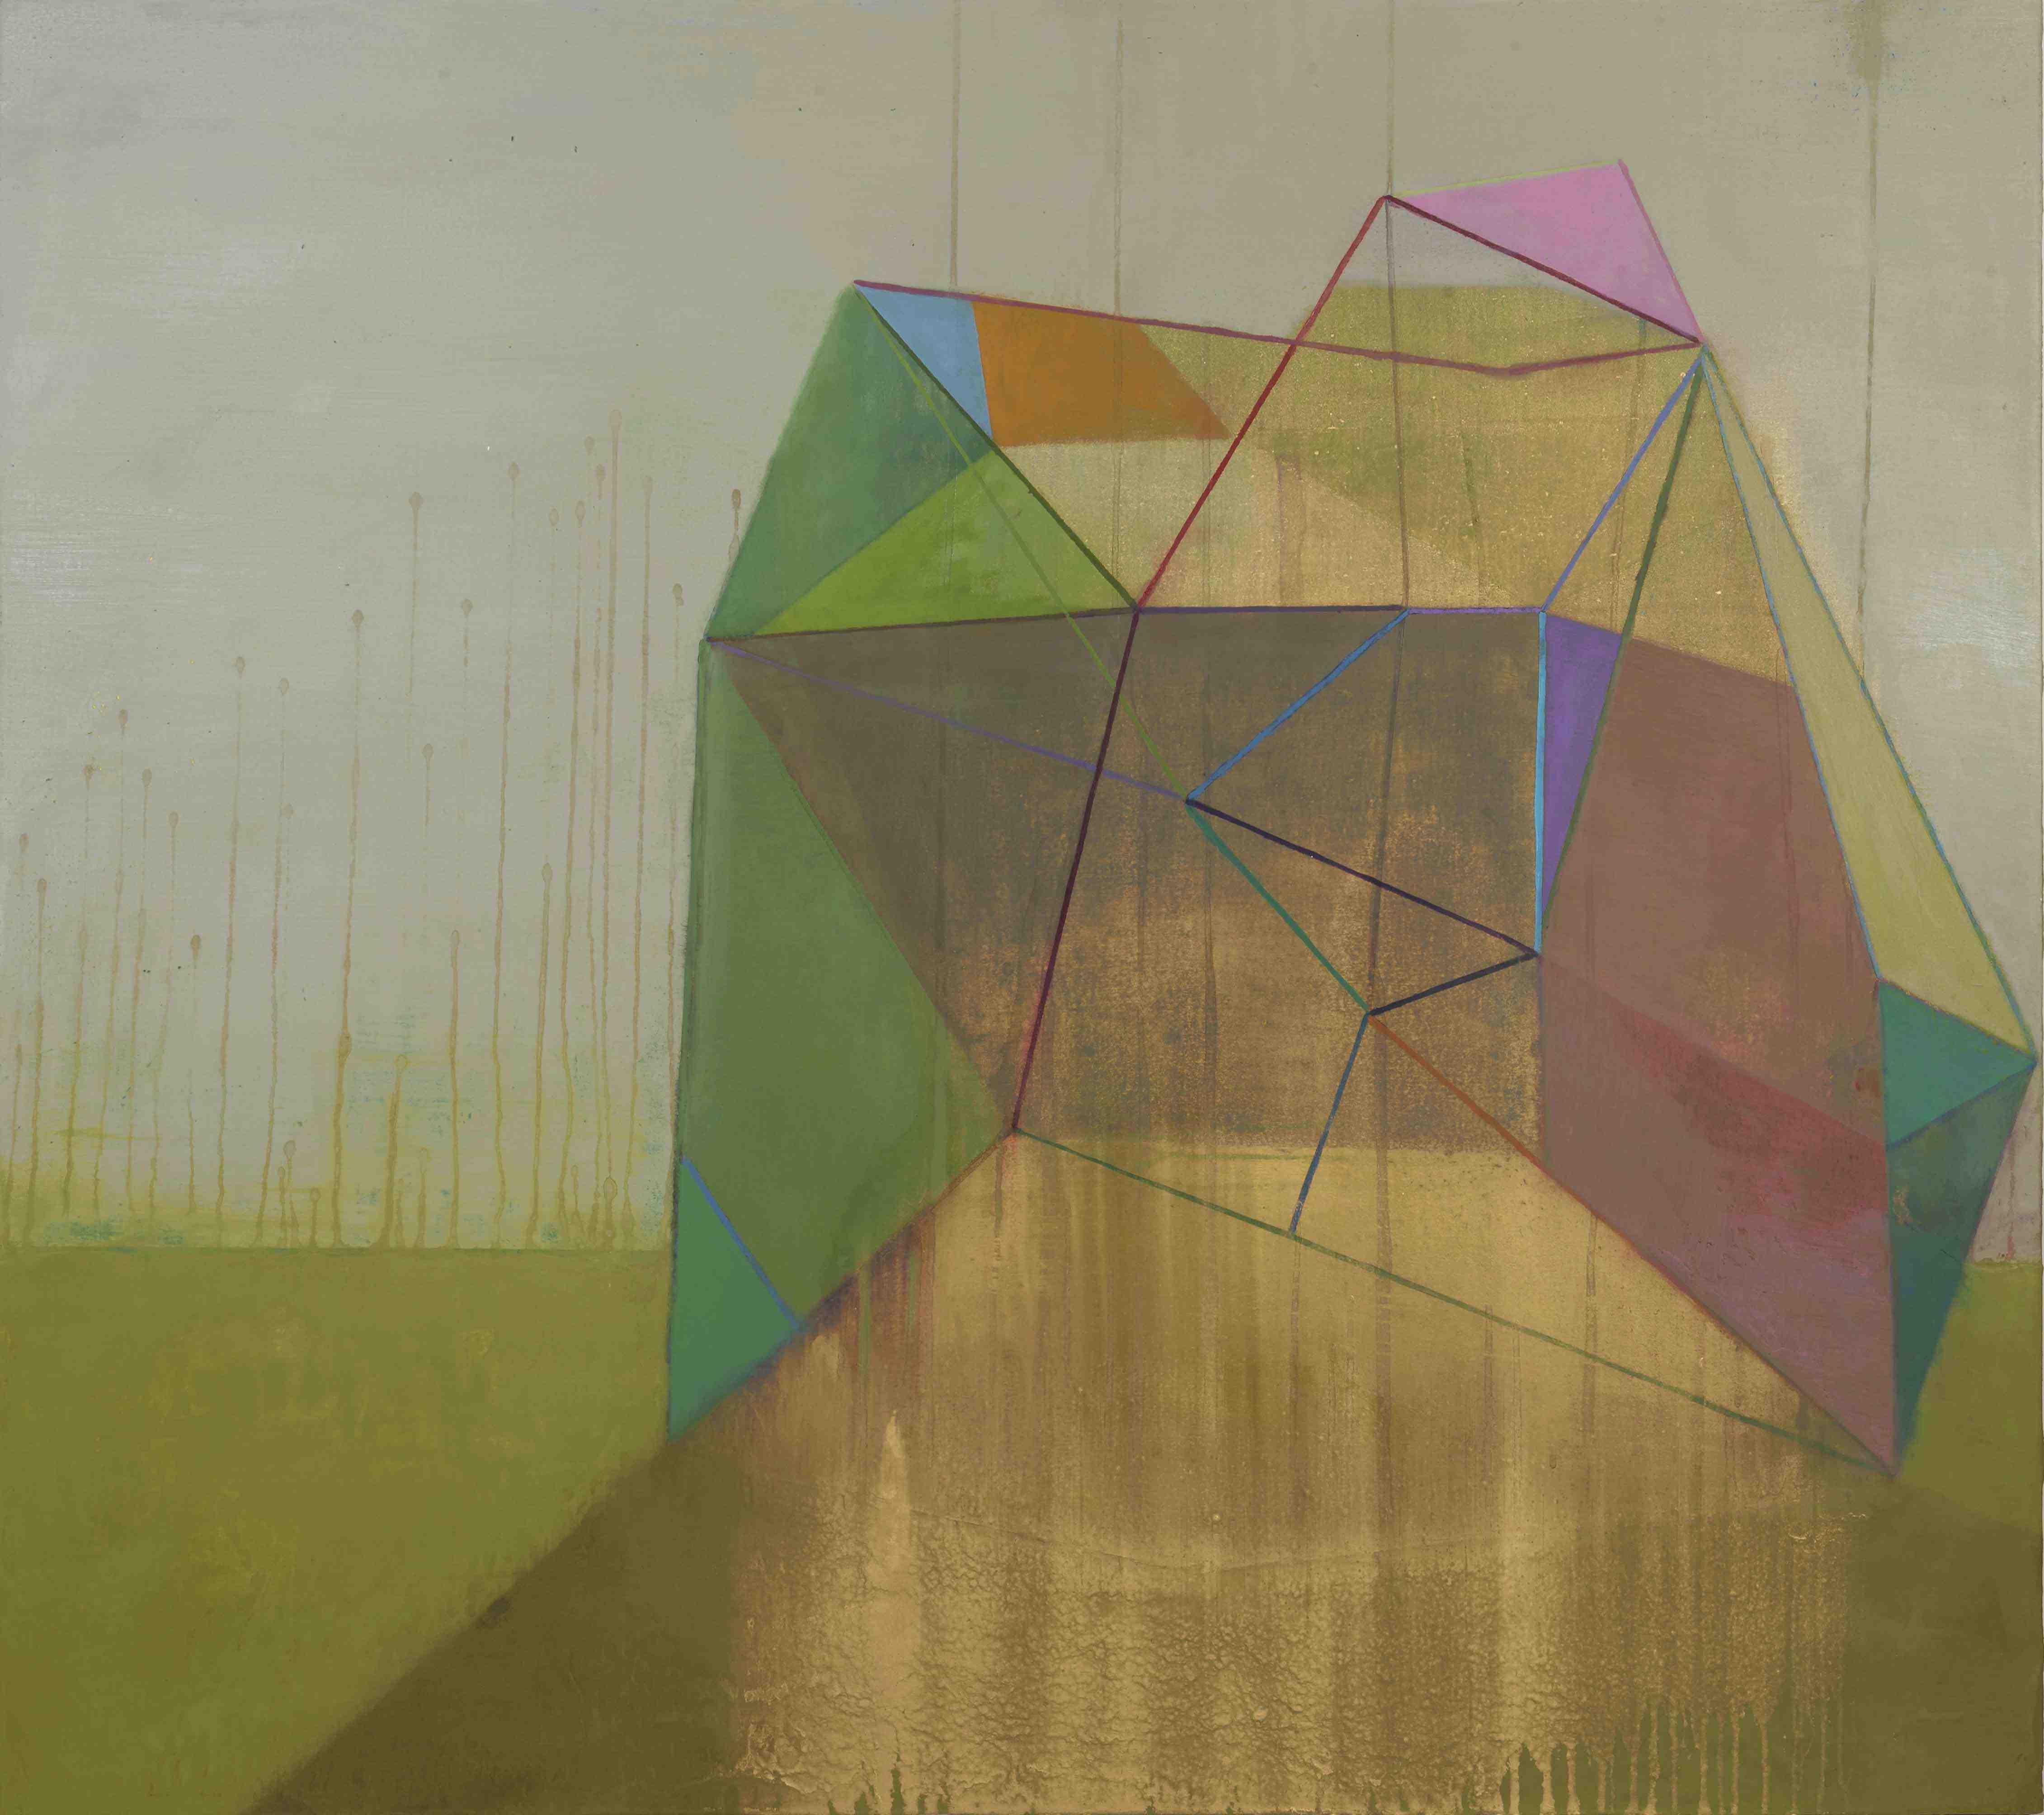 Tom Climent, Obtick, oil & plaster on canvas, 122 x 107 cm, €4,000